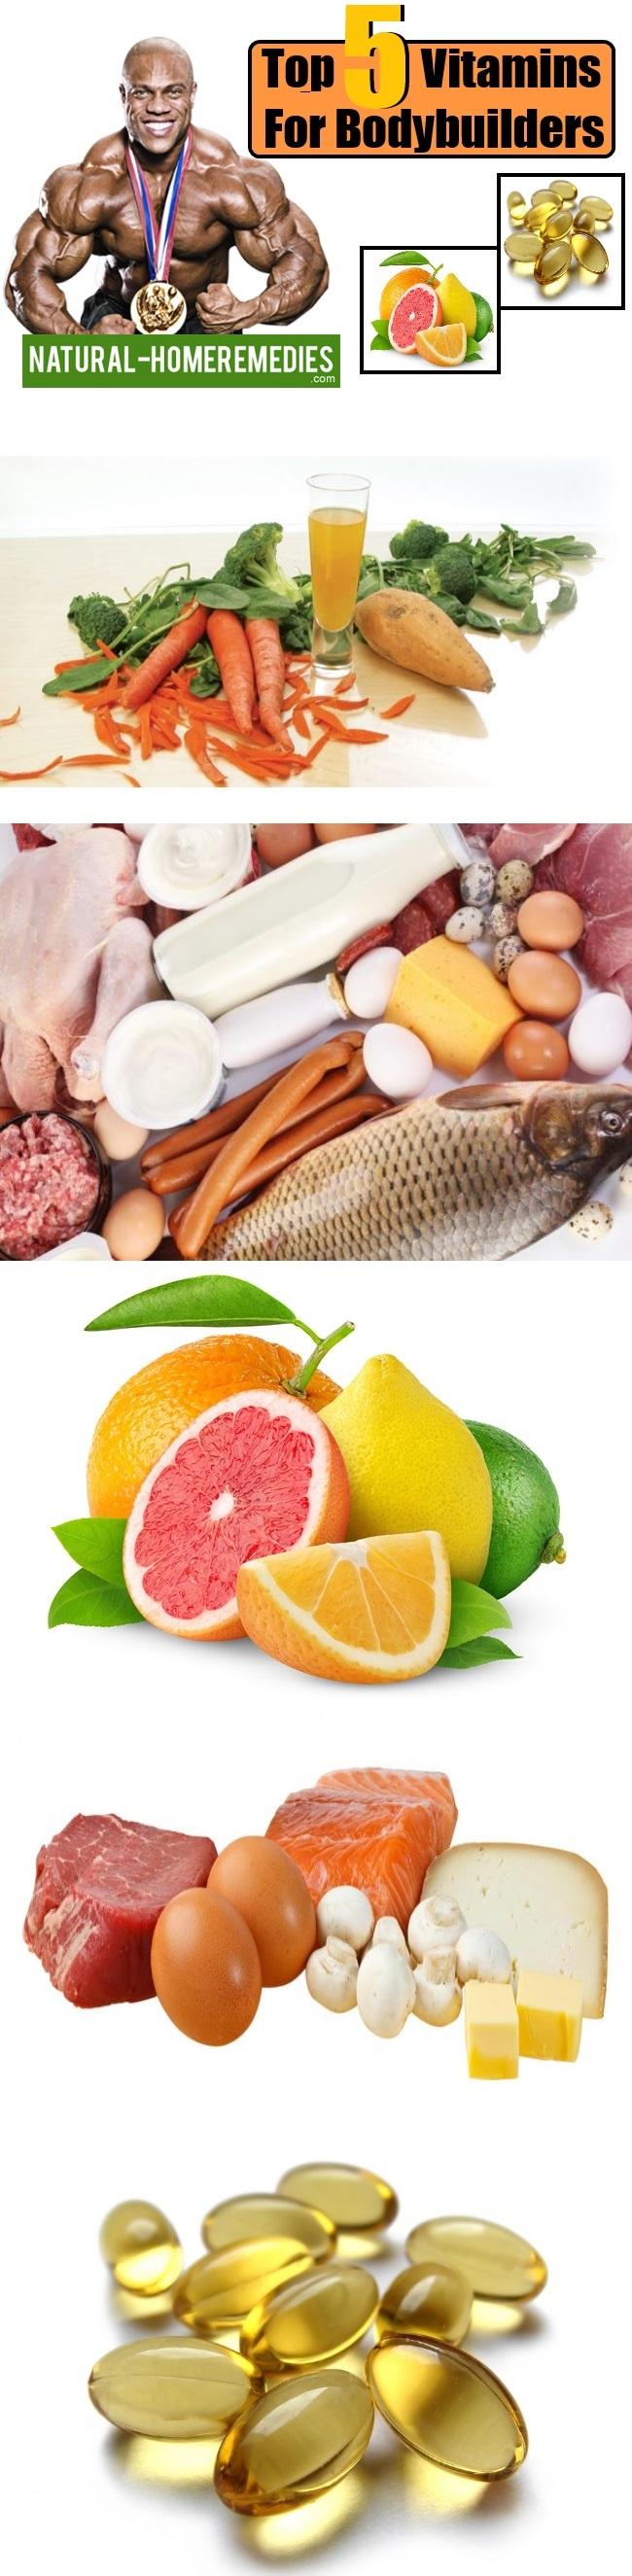 Top 5 Vitamins For Bodybuilders